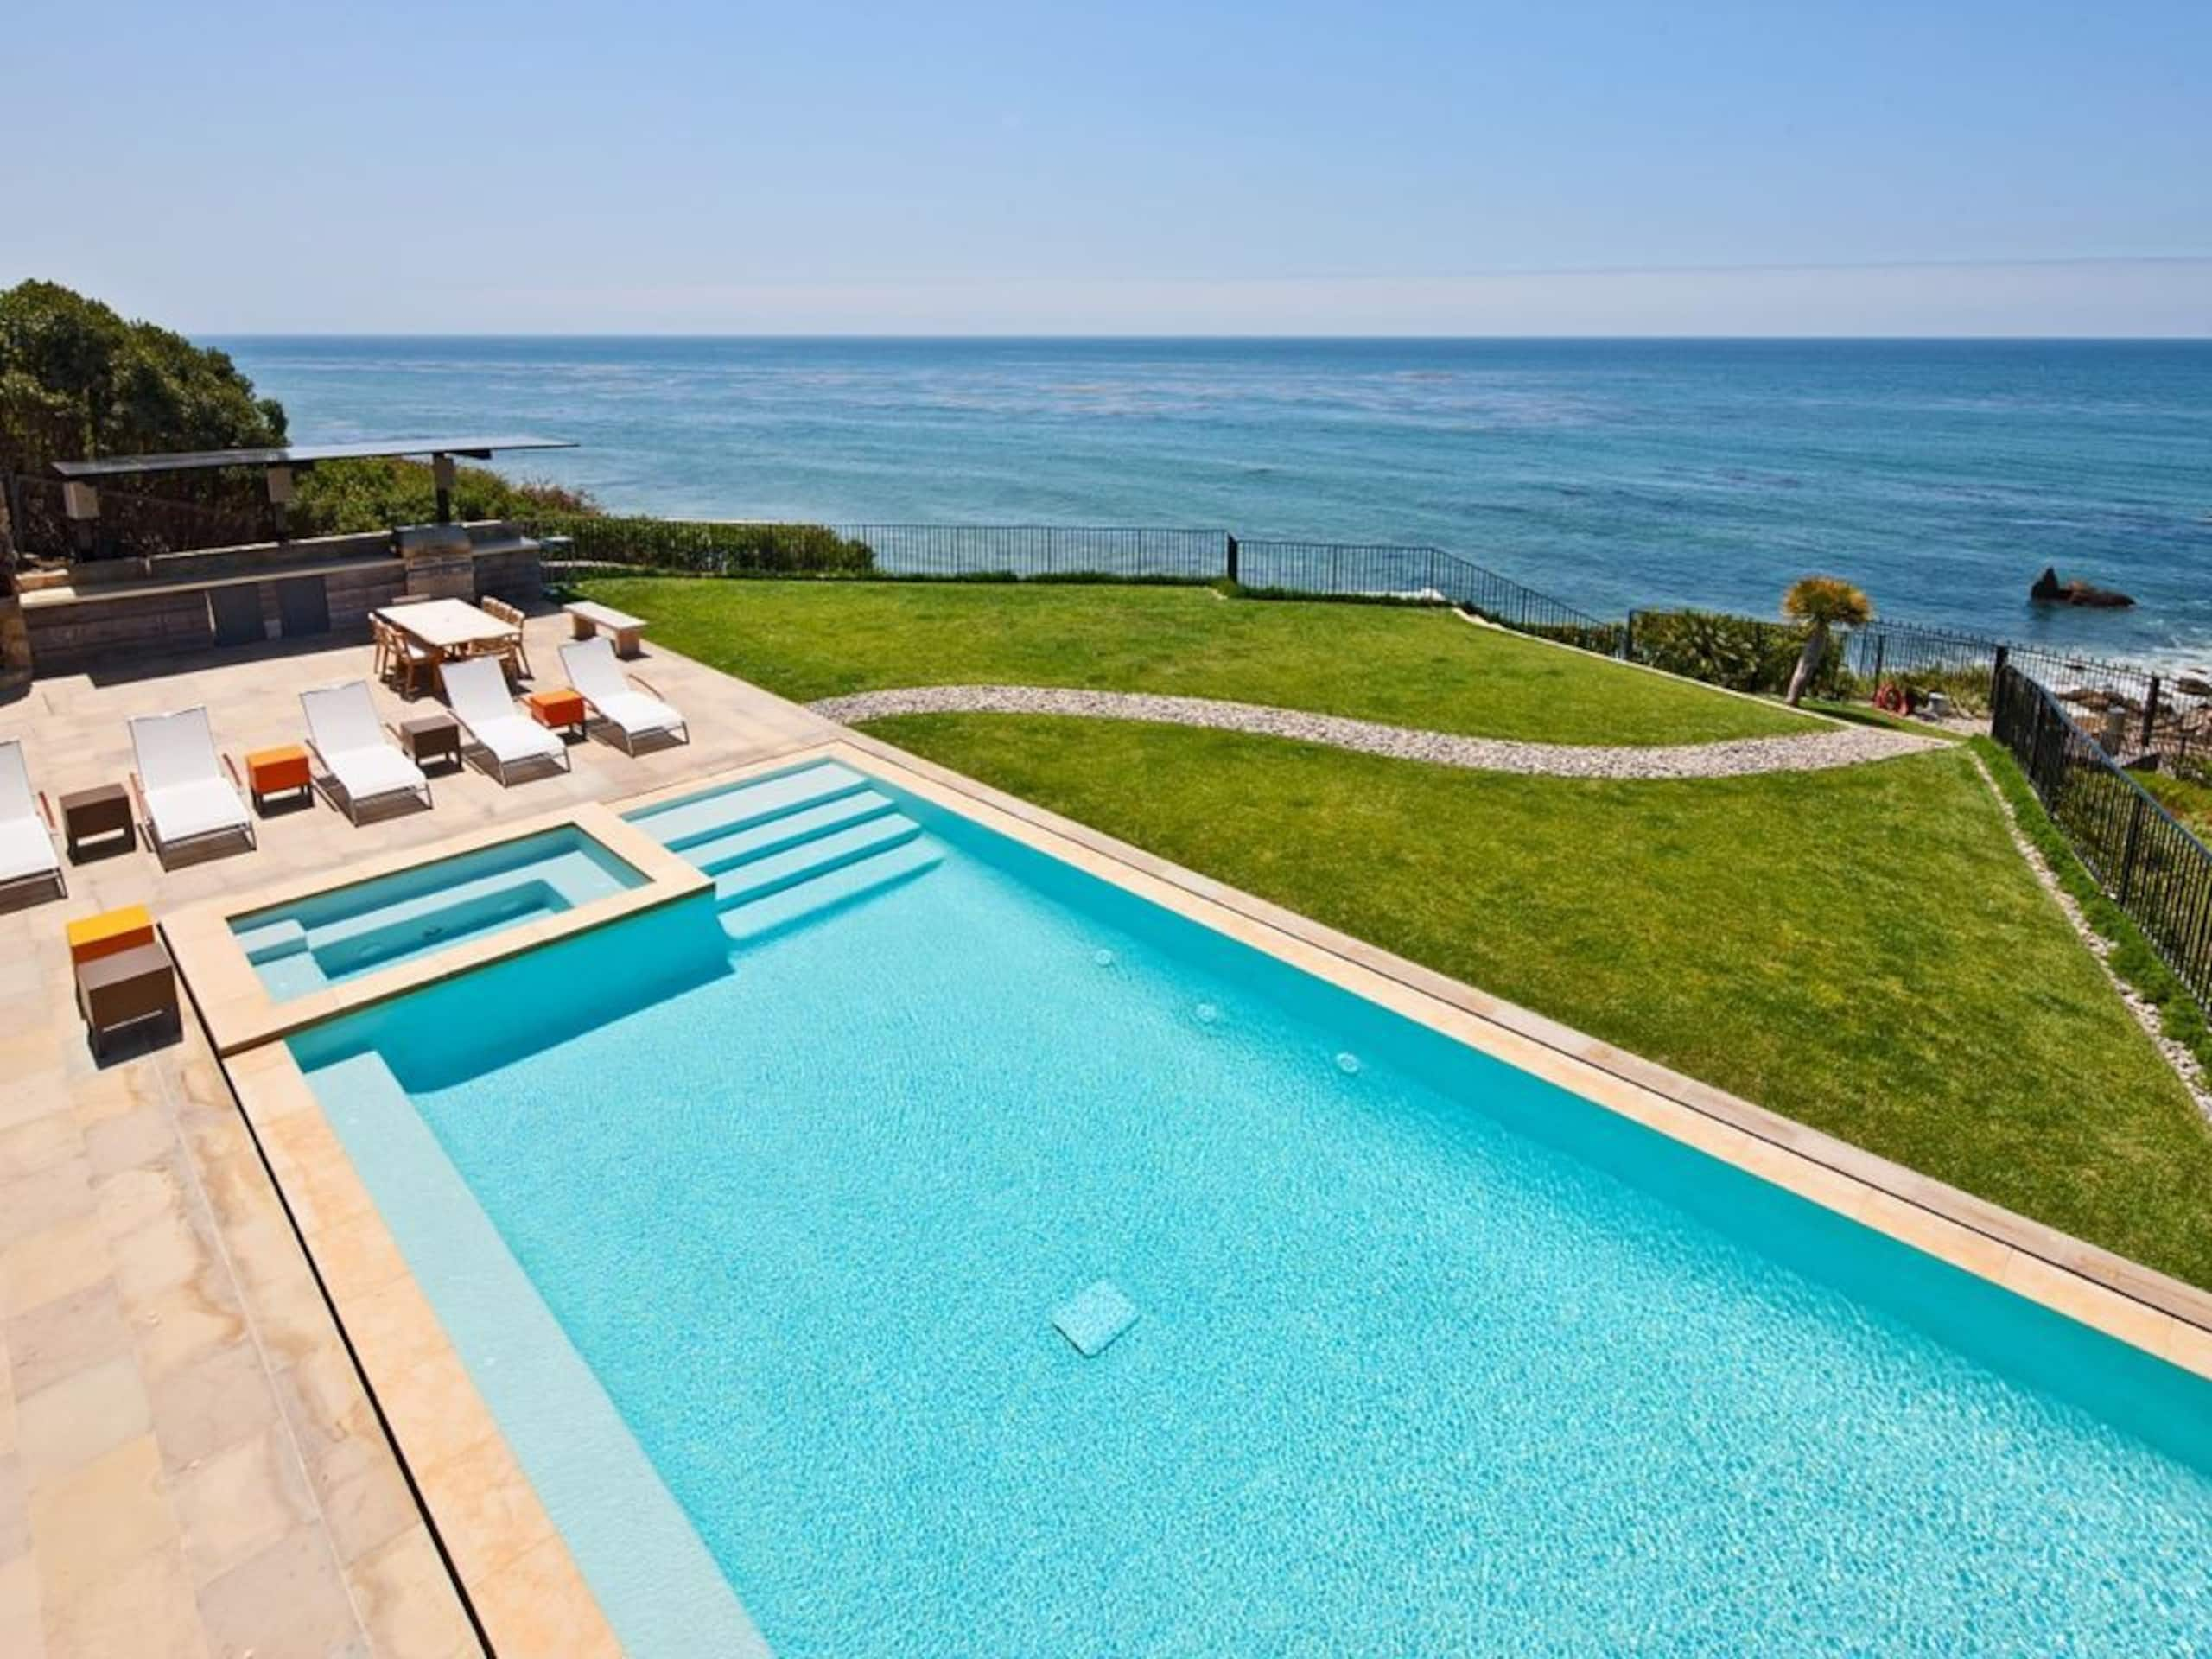 Apartment Villa Camden with Infinity Pool  Lawn  Gardens photo 20276207